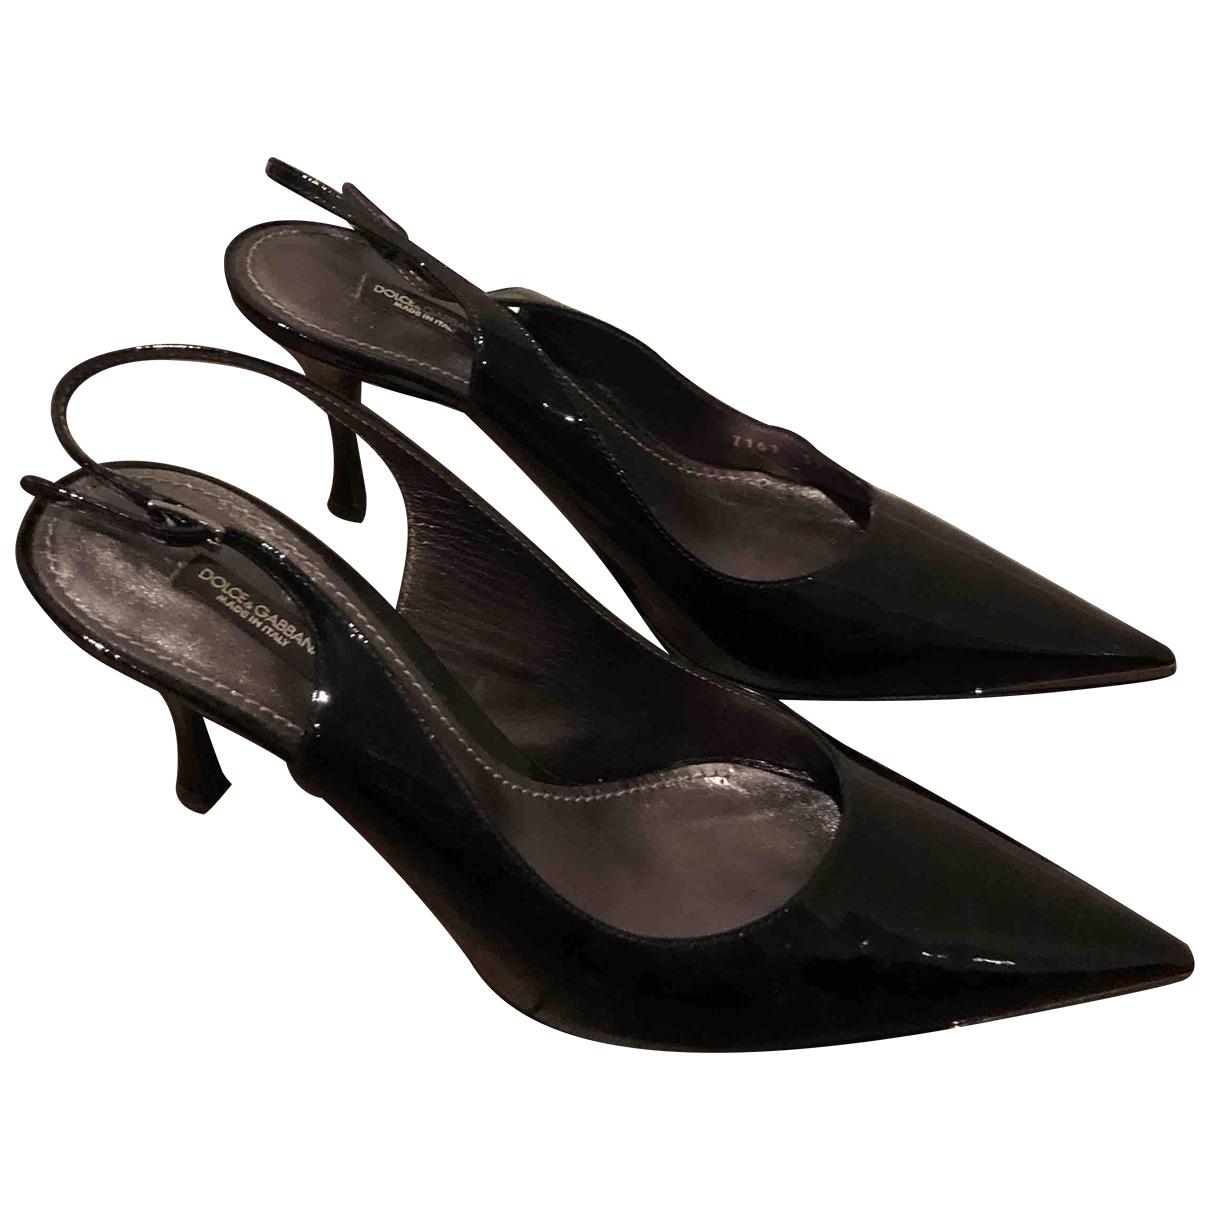 Dolce & Gabbana \N Black Patent leather Heels for Women 39.5 EU